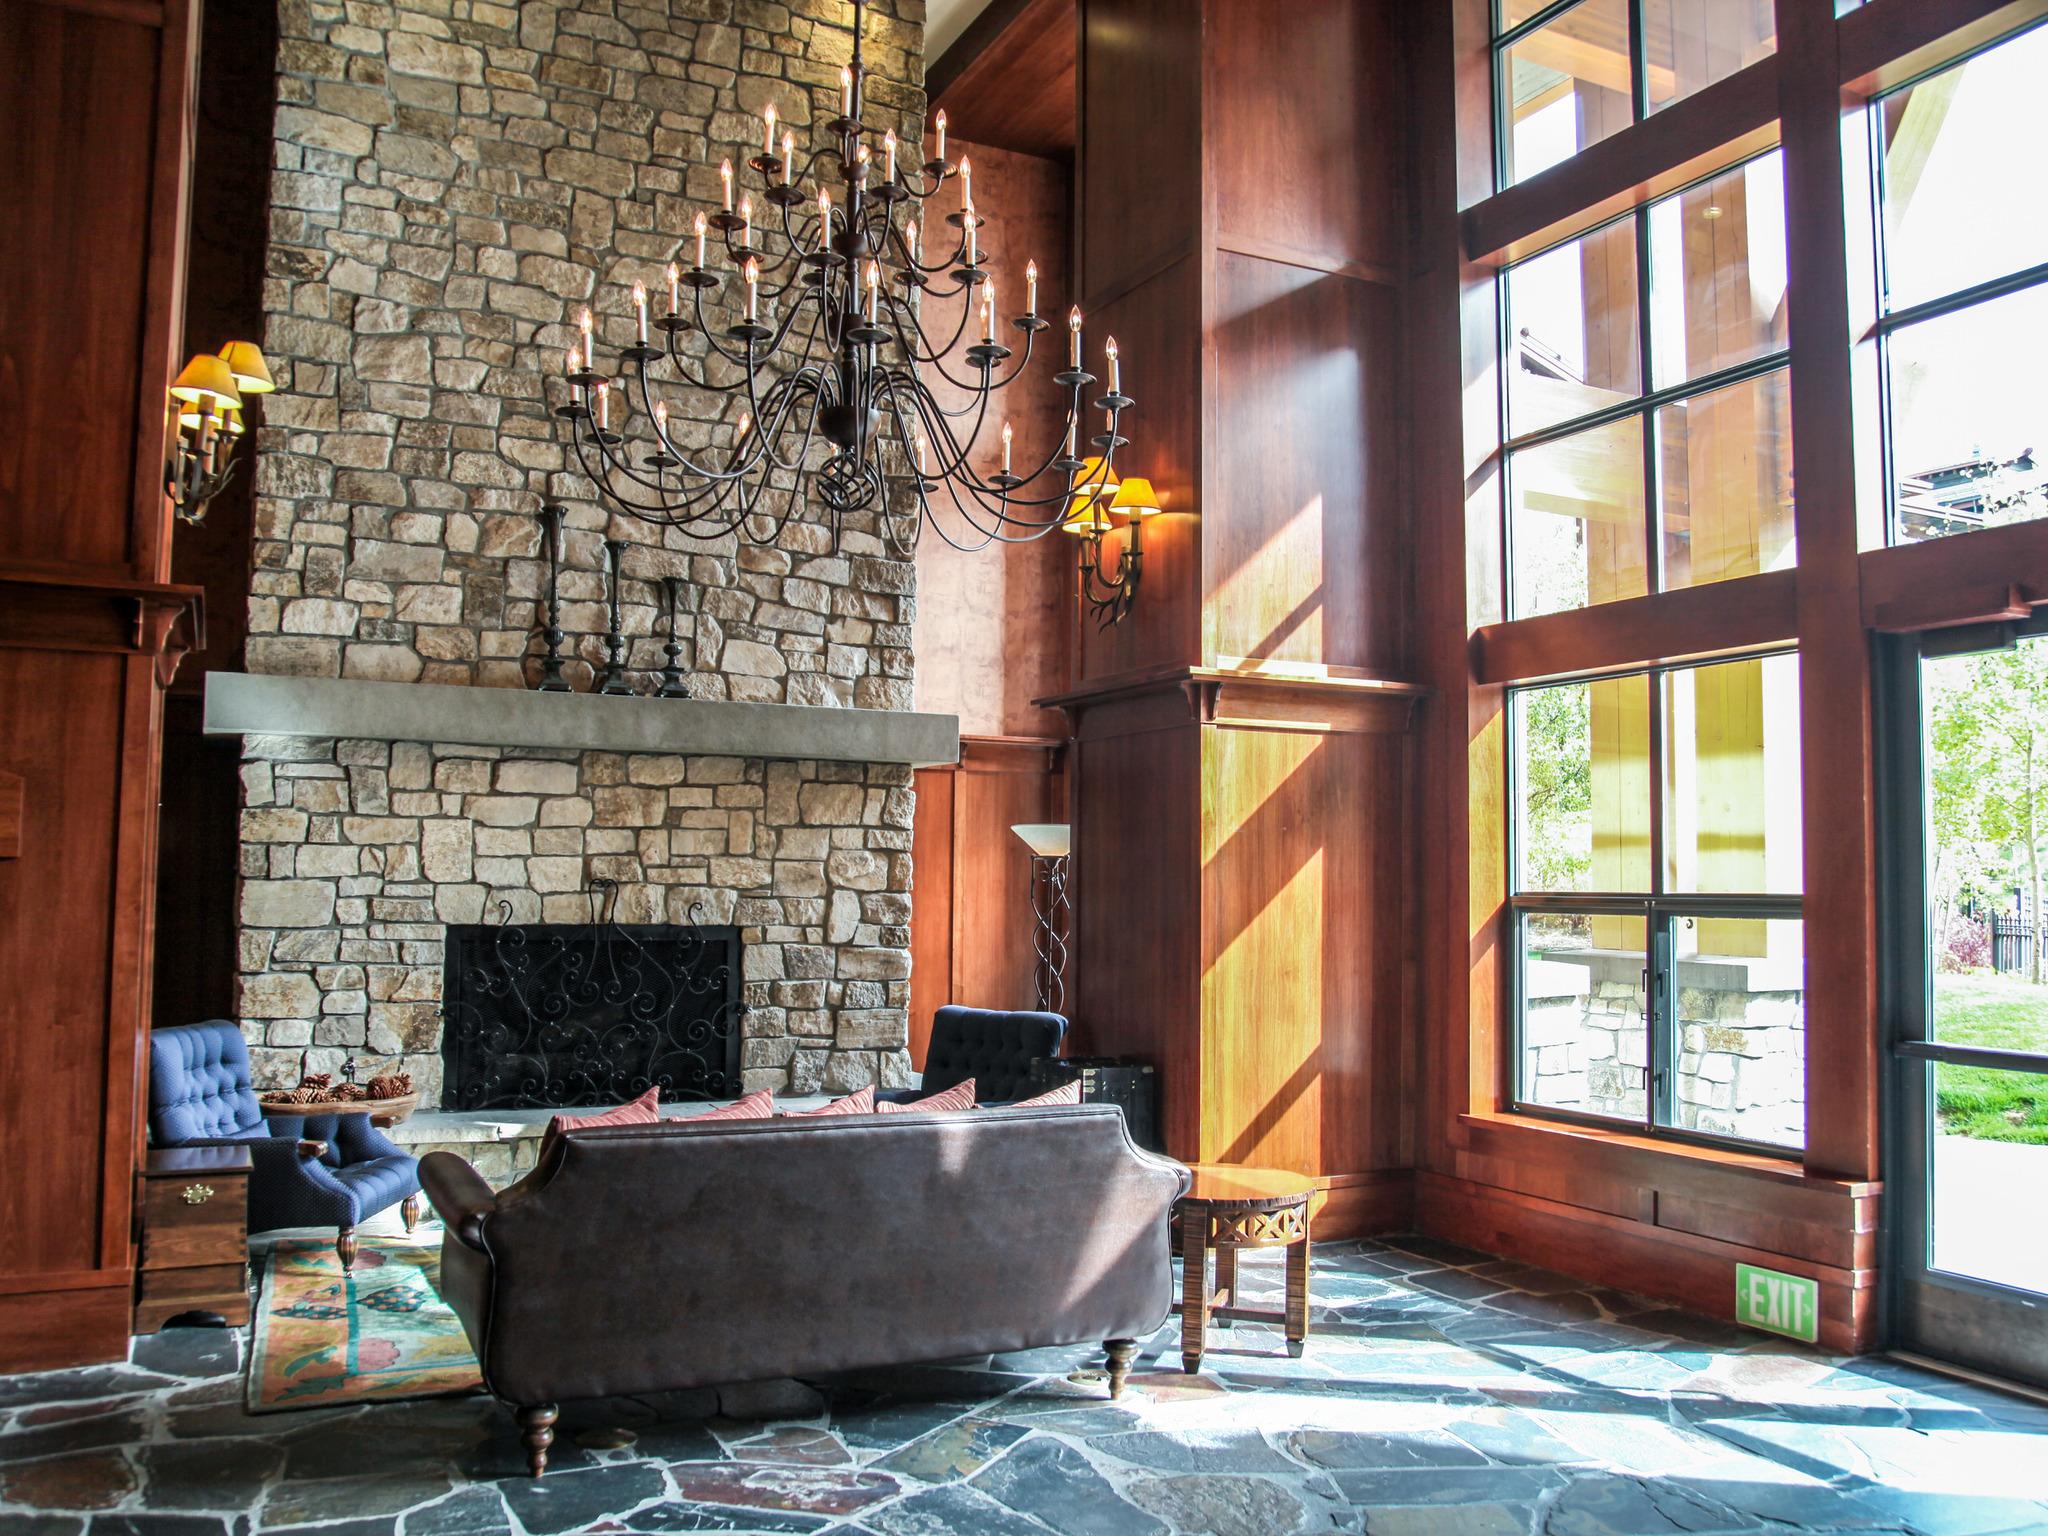 Grand Sierra Lodge 1421 Mammoth Lakes Ca Vacation